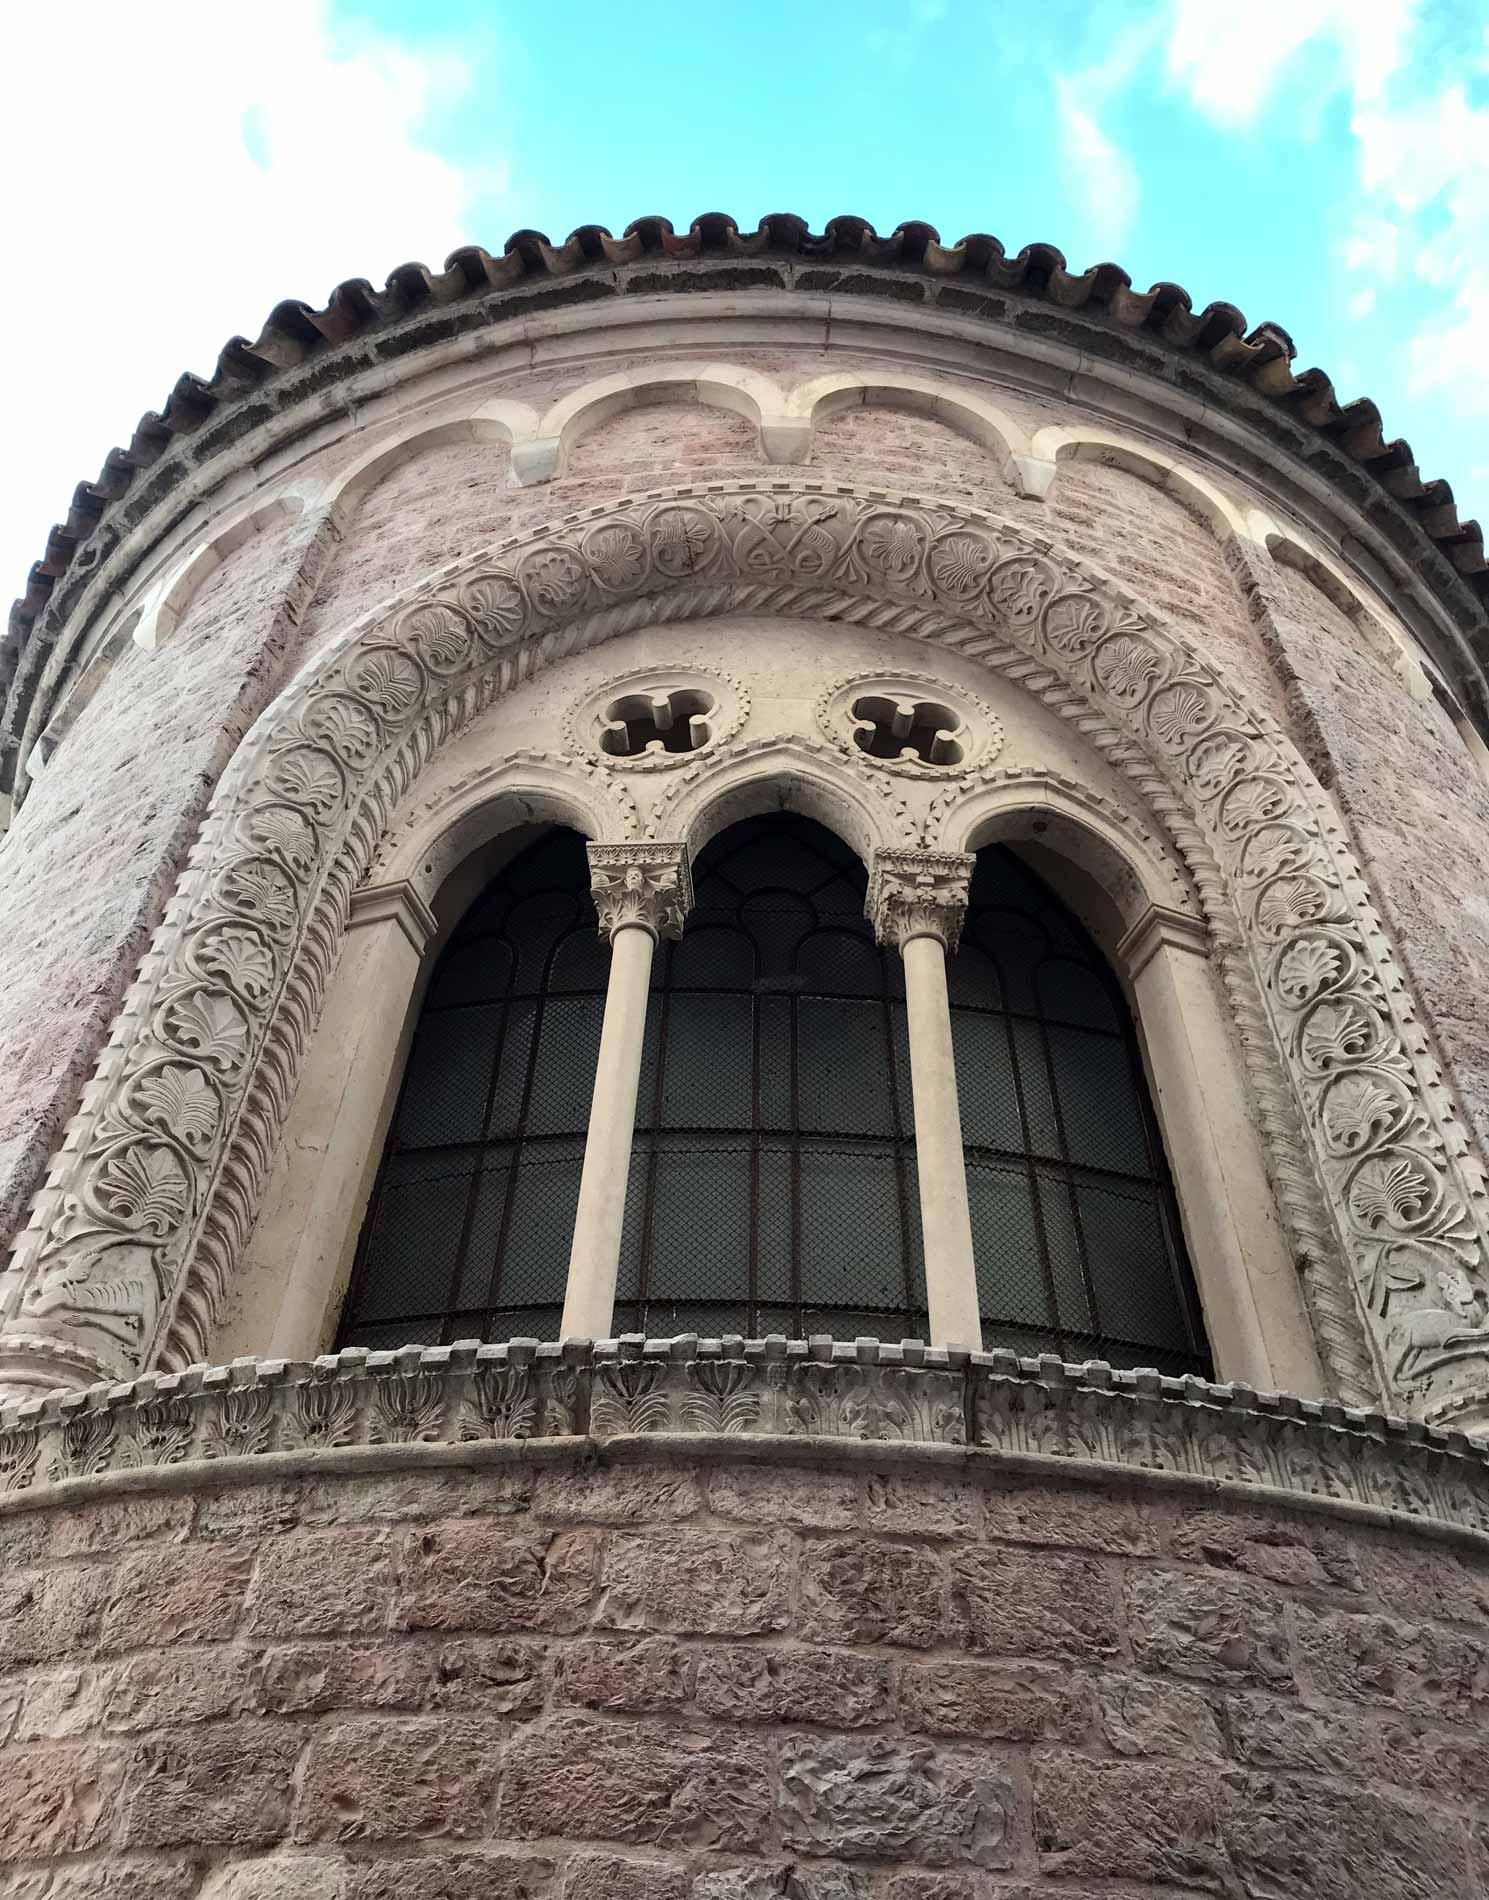 Kotor-Montenegro-cattedrale-di-San-Trifone-abside-trifora-foglie-dacanto